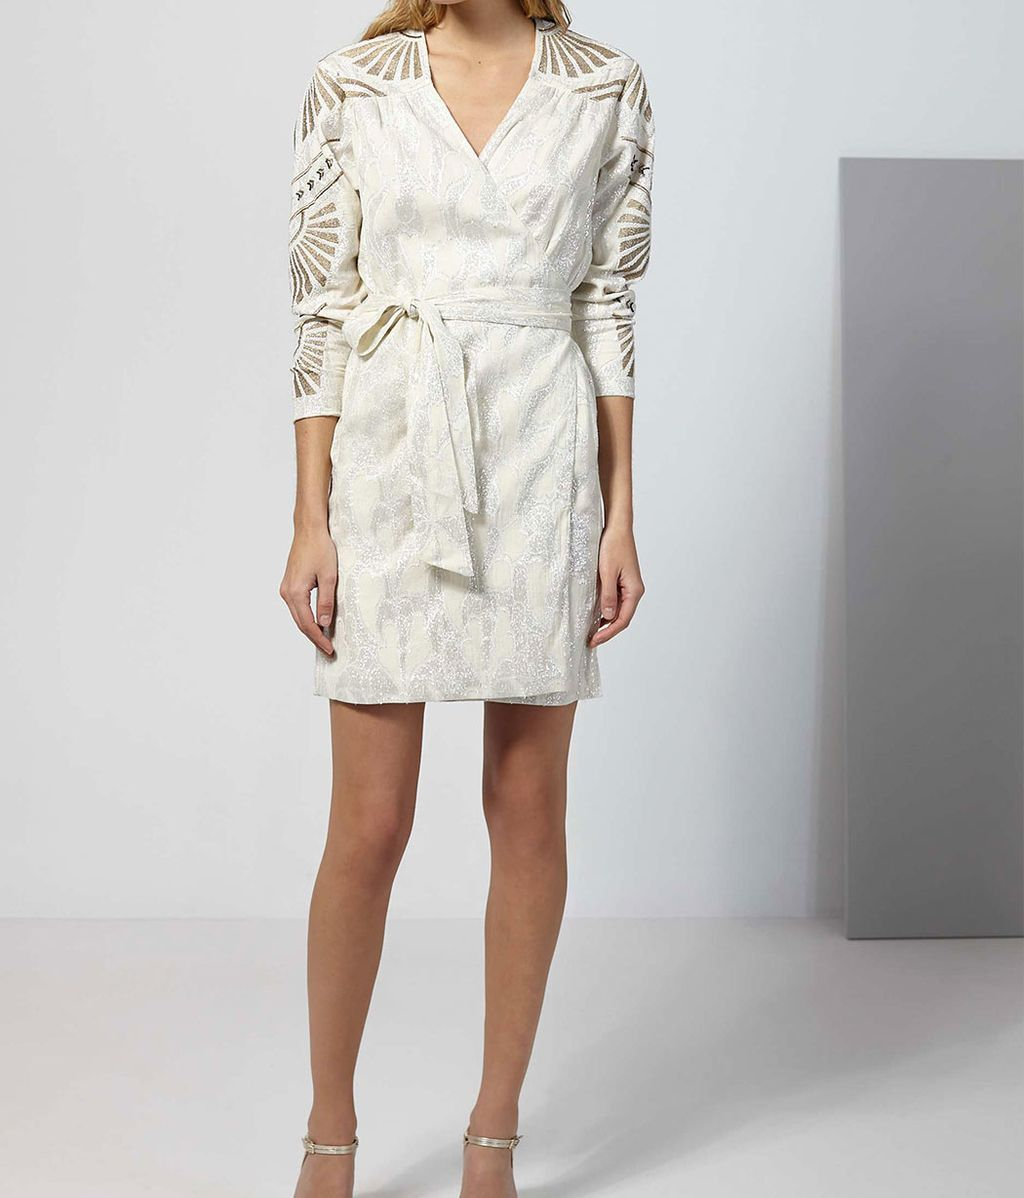 Vestido de jacquard de Intropia